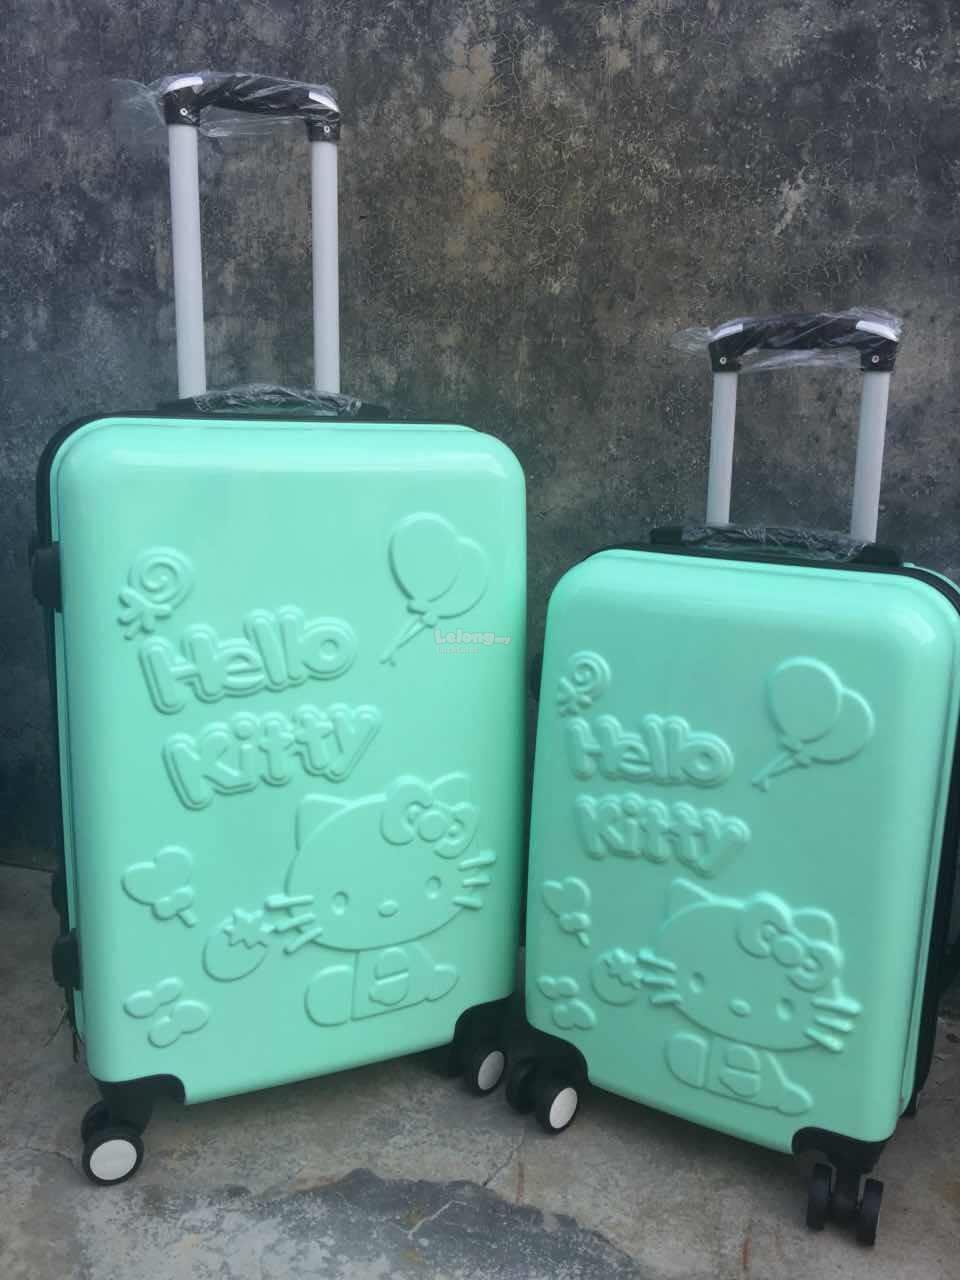 a7a9d6218 Travel Luggage Bag Cute Hello Kitty New Fashion Buy 1 Free 1